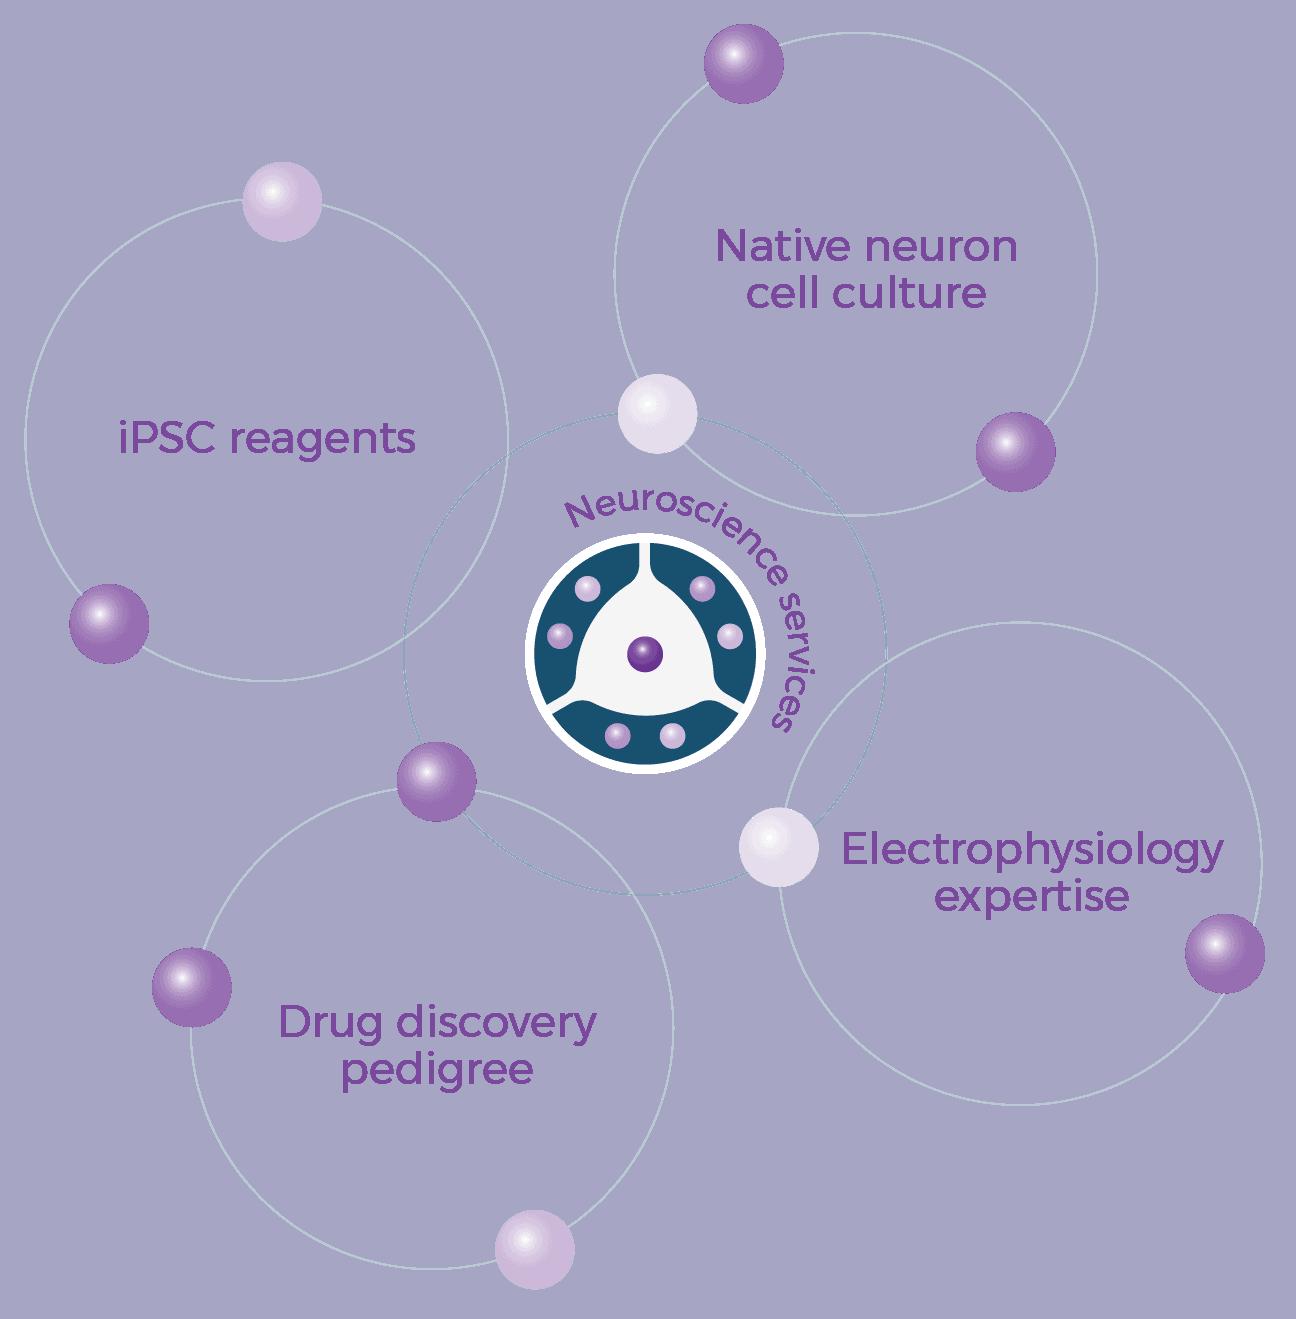 Neuroscience Services Diagram 01